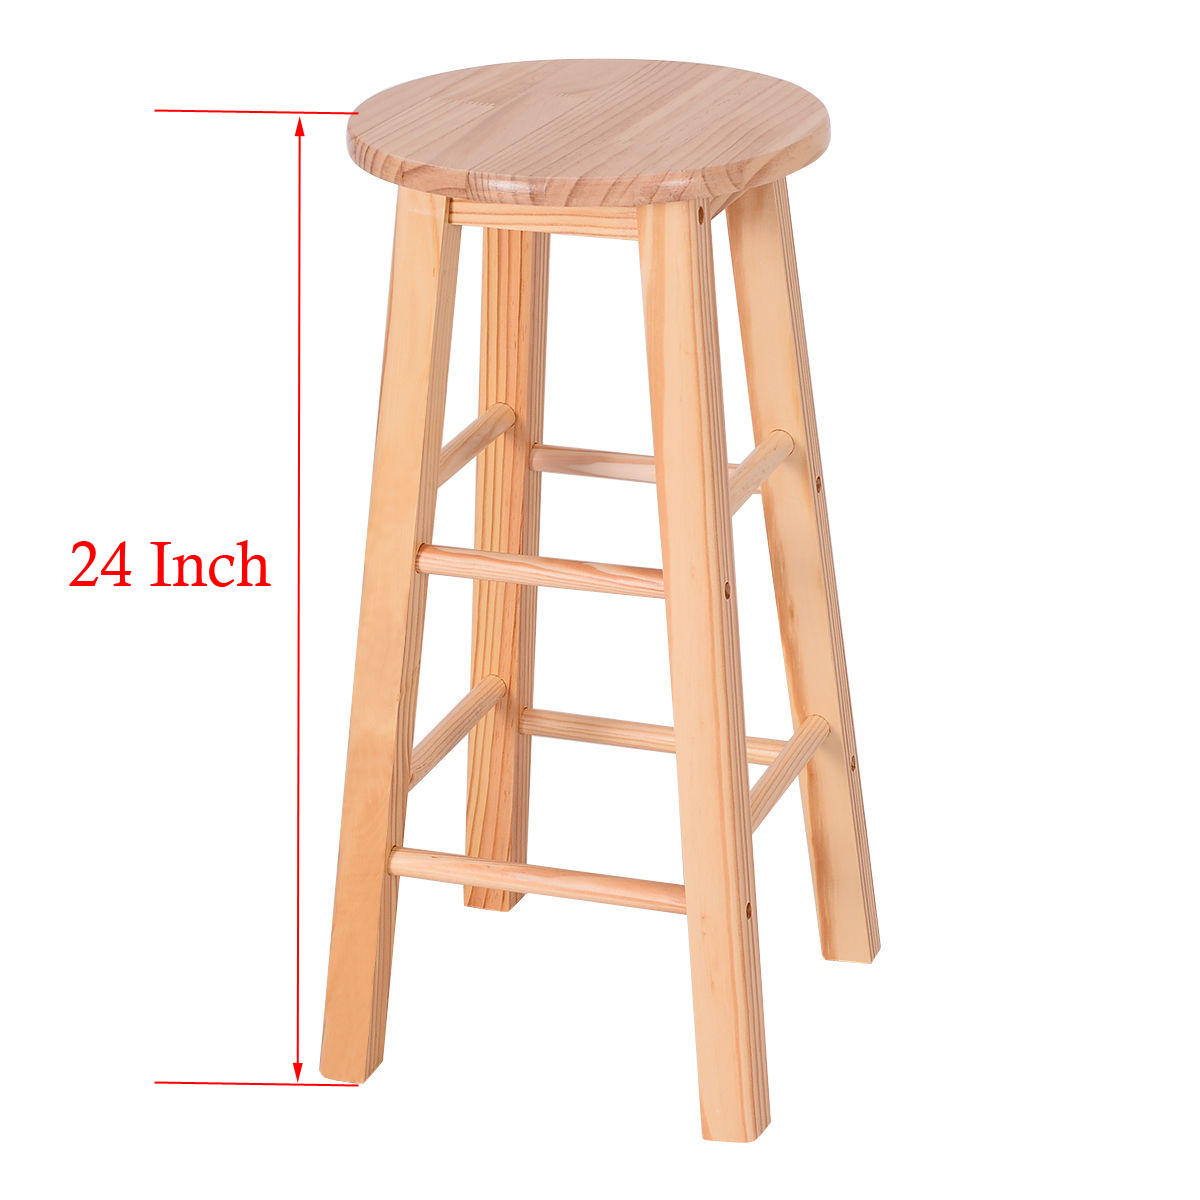 Set of 2 Wood Counter Stools Bar Stools Dining Kitchen  : 132F130278292F13027829 5 170901110426 from www.ebay.com size 1200 x 1200 jpeg 189kB